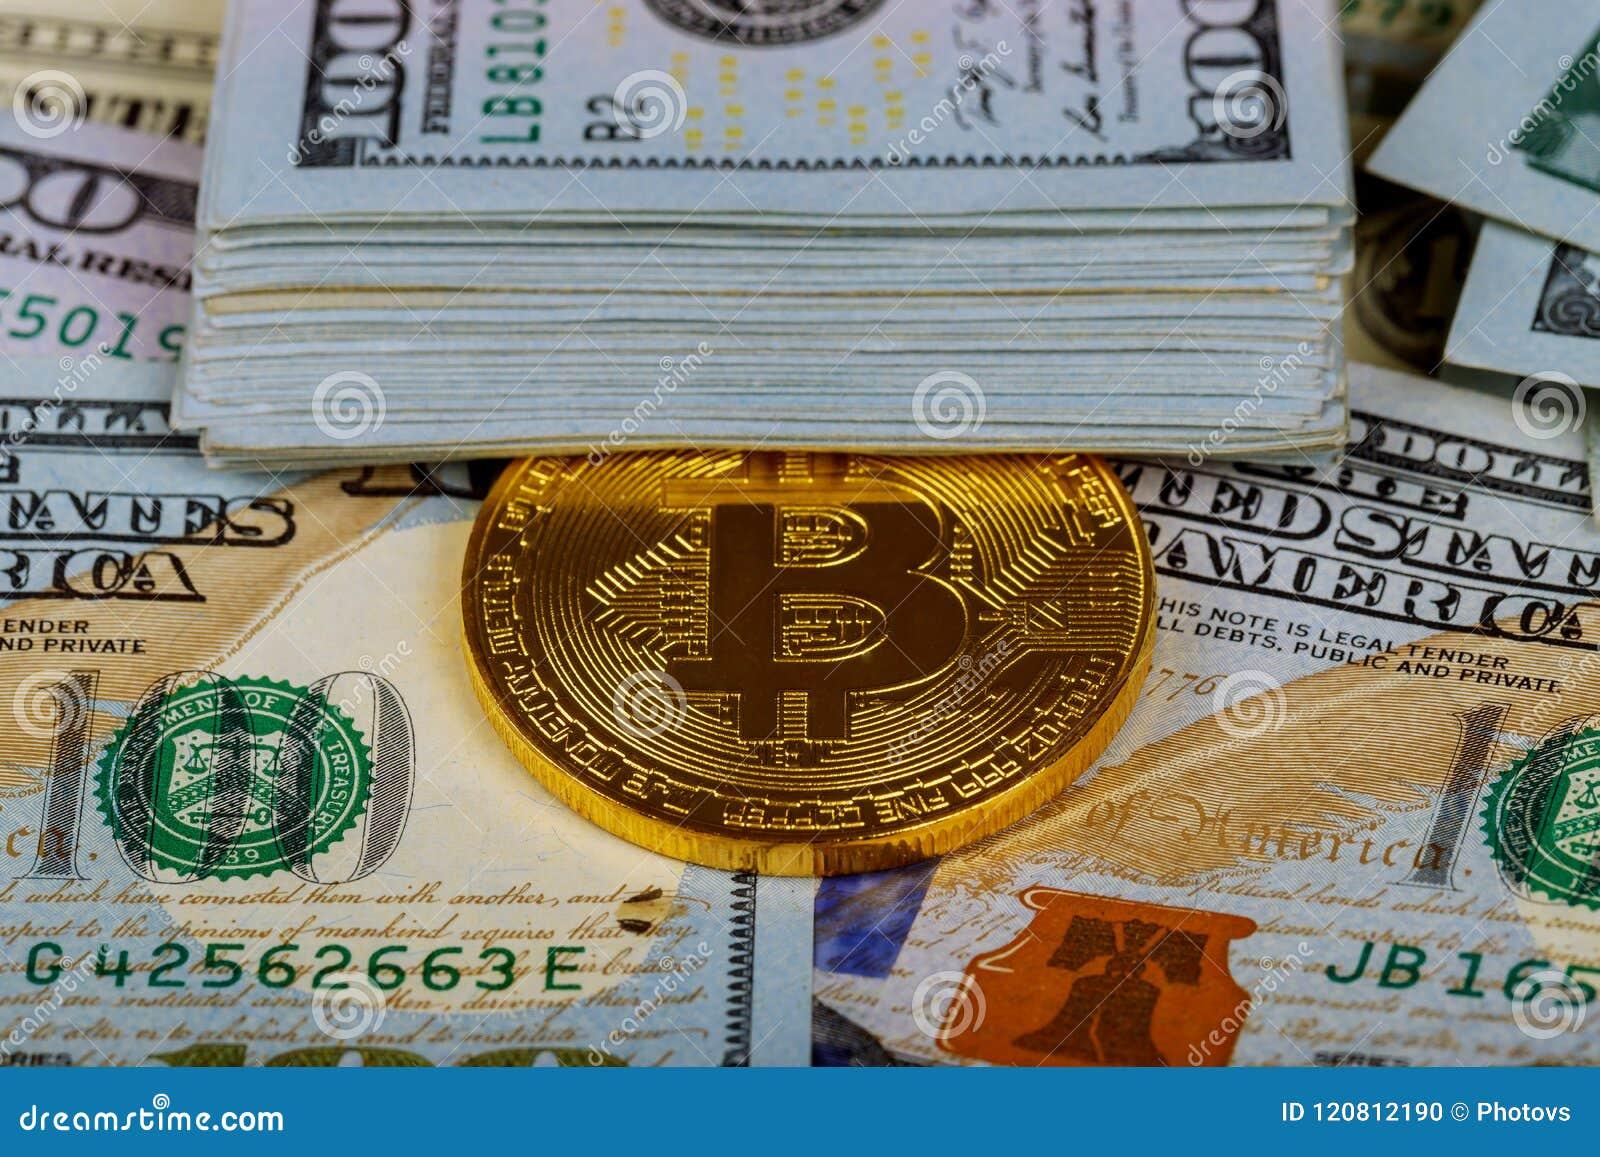 bitcoin em dolar)